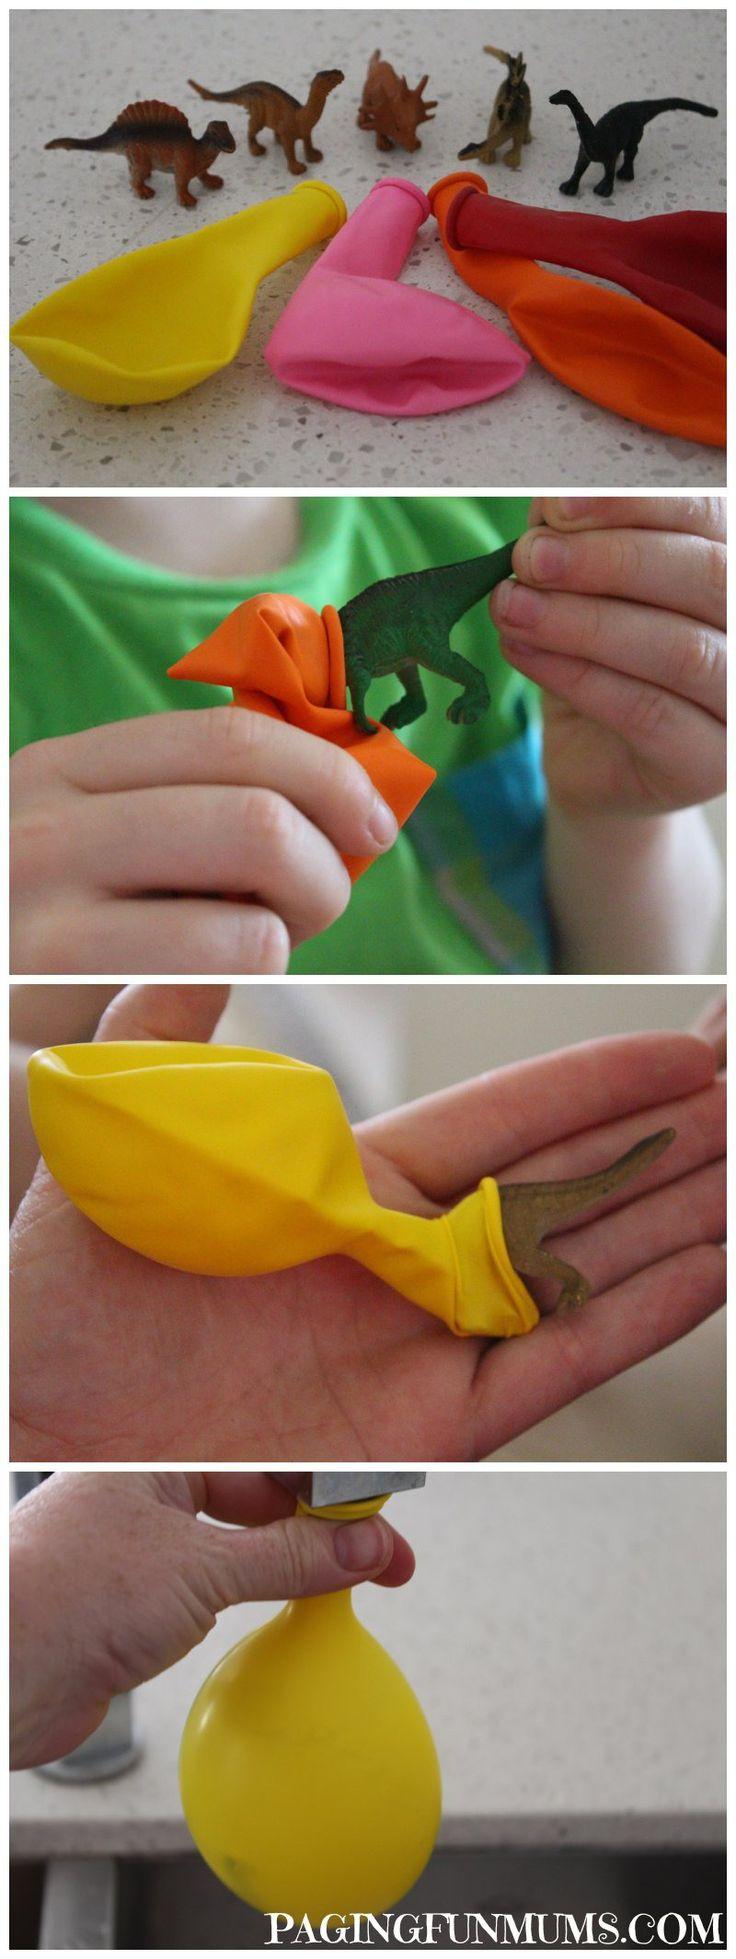 Frozen Dinosaur Eggs! - find and excavate dinos frozen in time.